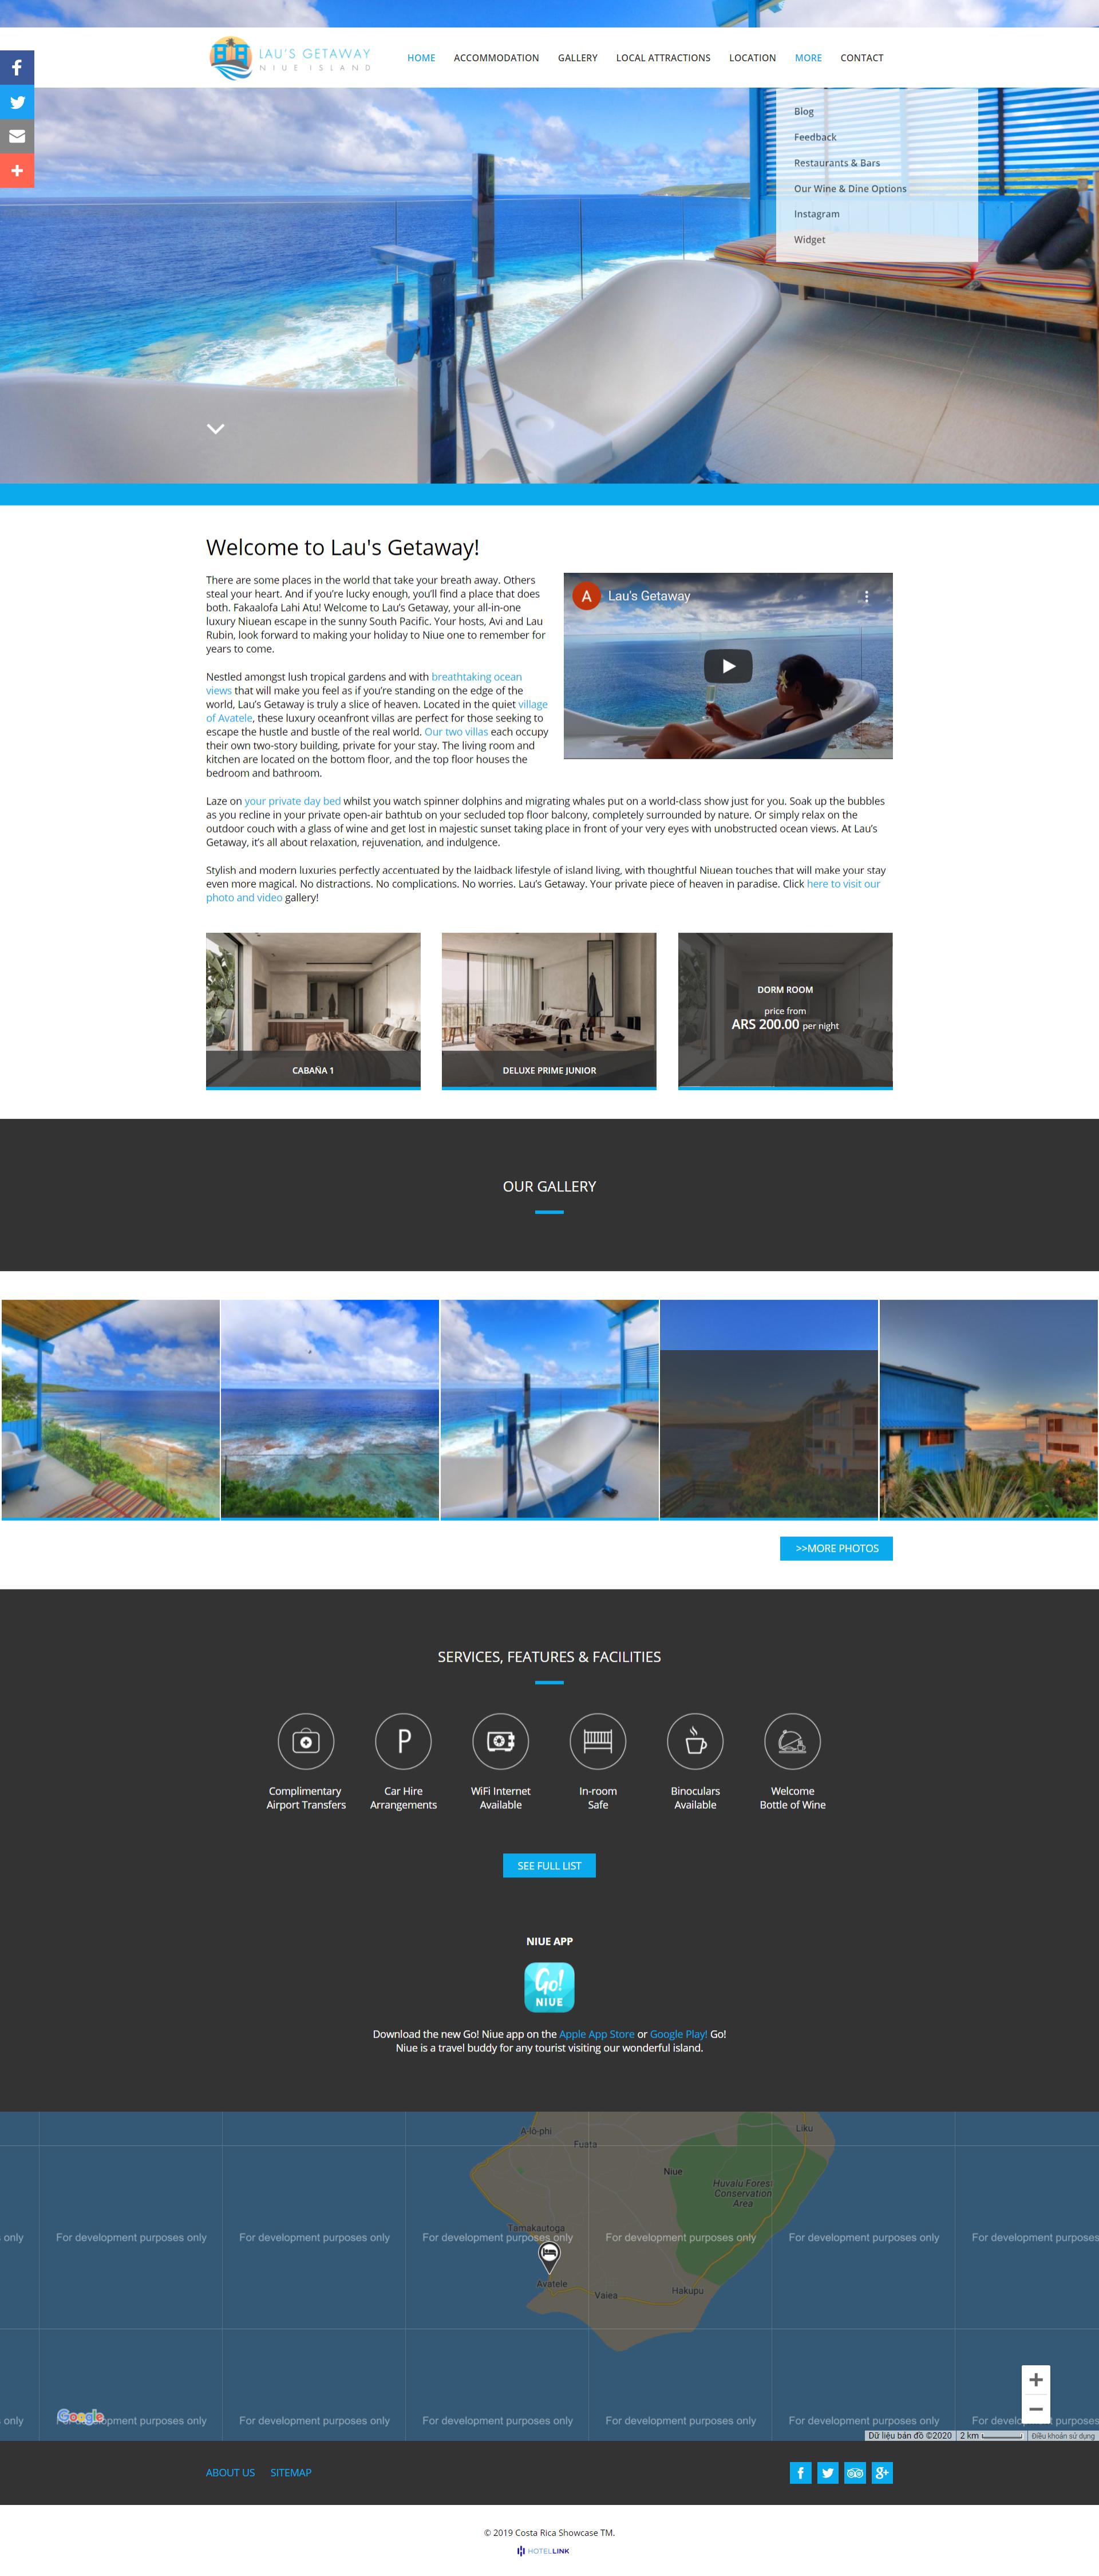 Hotel Link website template